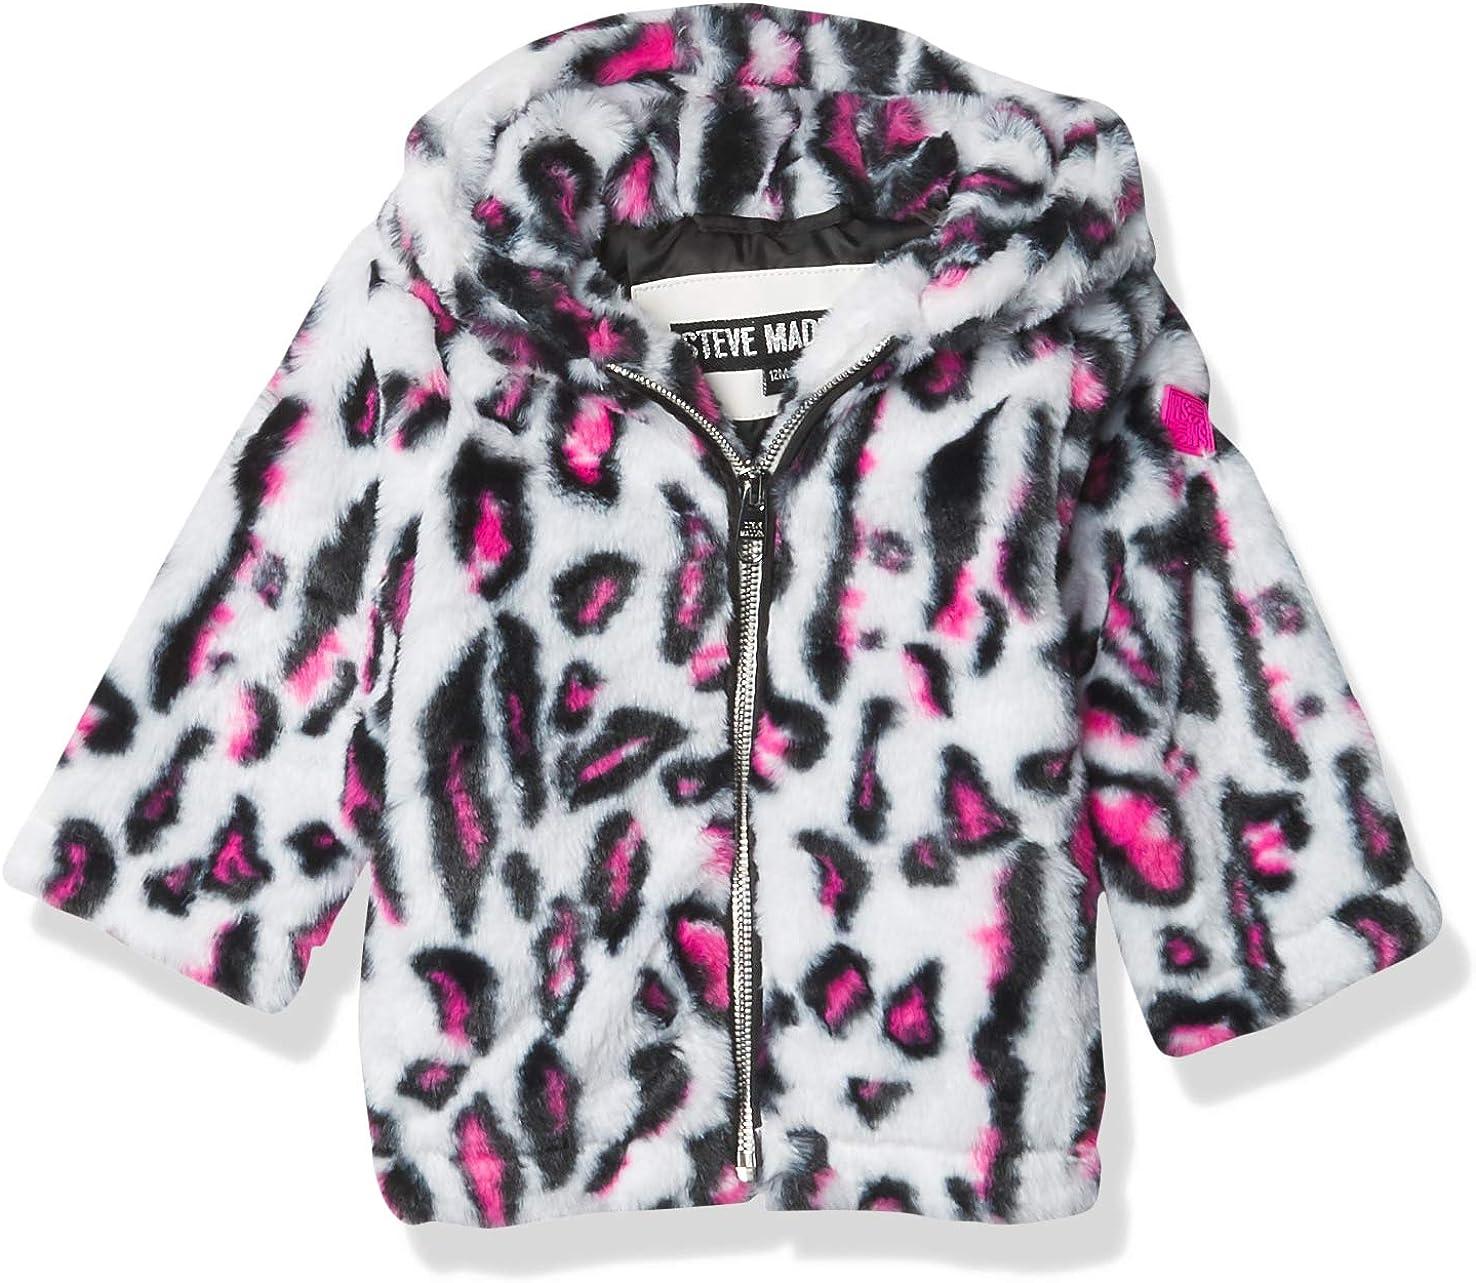 Steve Madden Baby online shopping Cheap SALE Start Heavy Outerwear